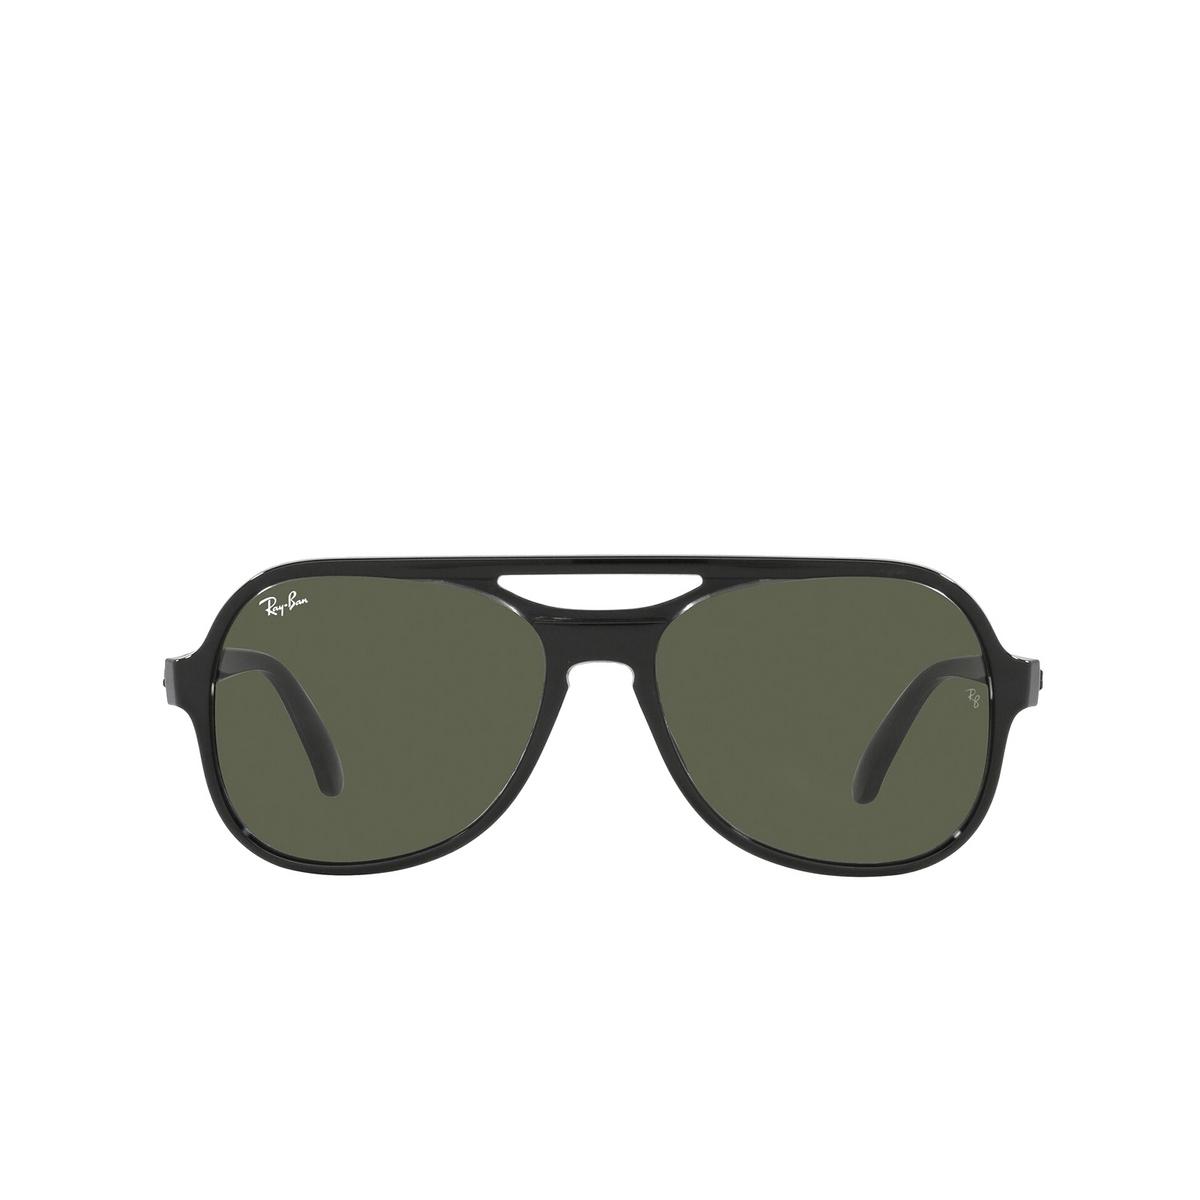 Ray-Ban® Aviator Sunglasses: Powderhorn RB4357 color Black Transparent Black 654531 - front view.